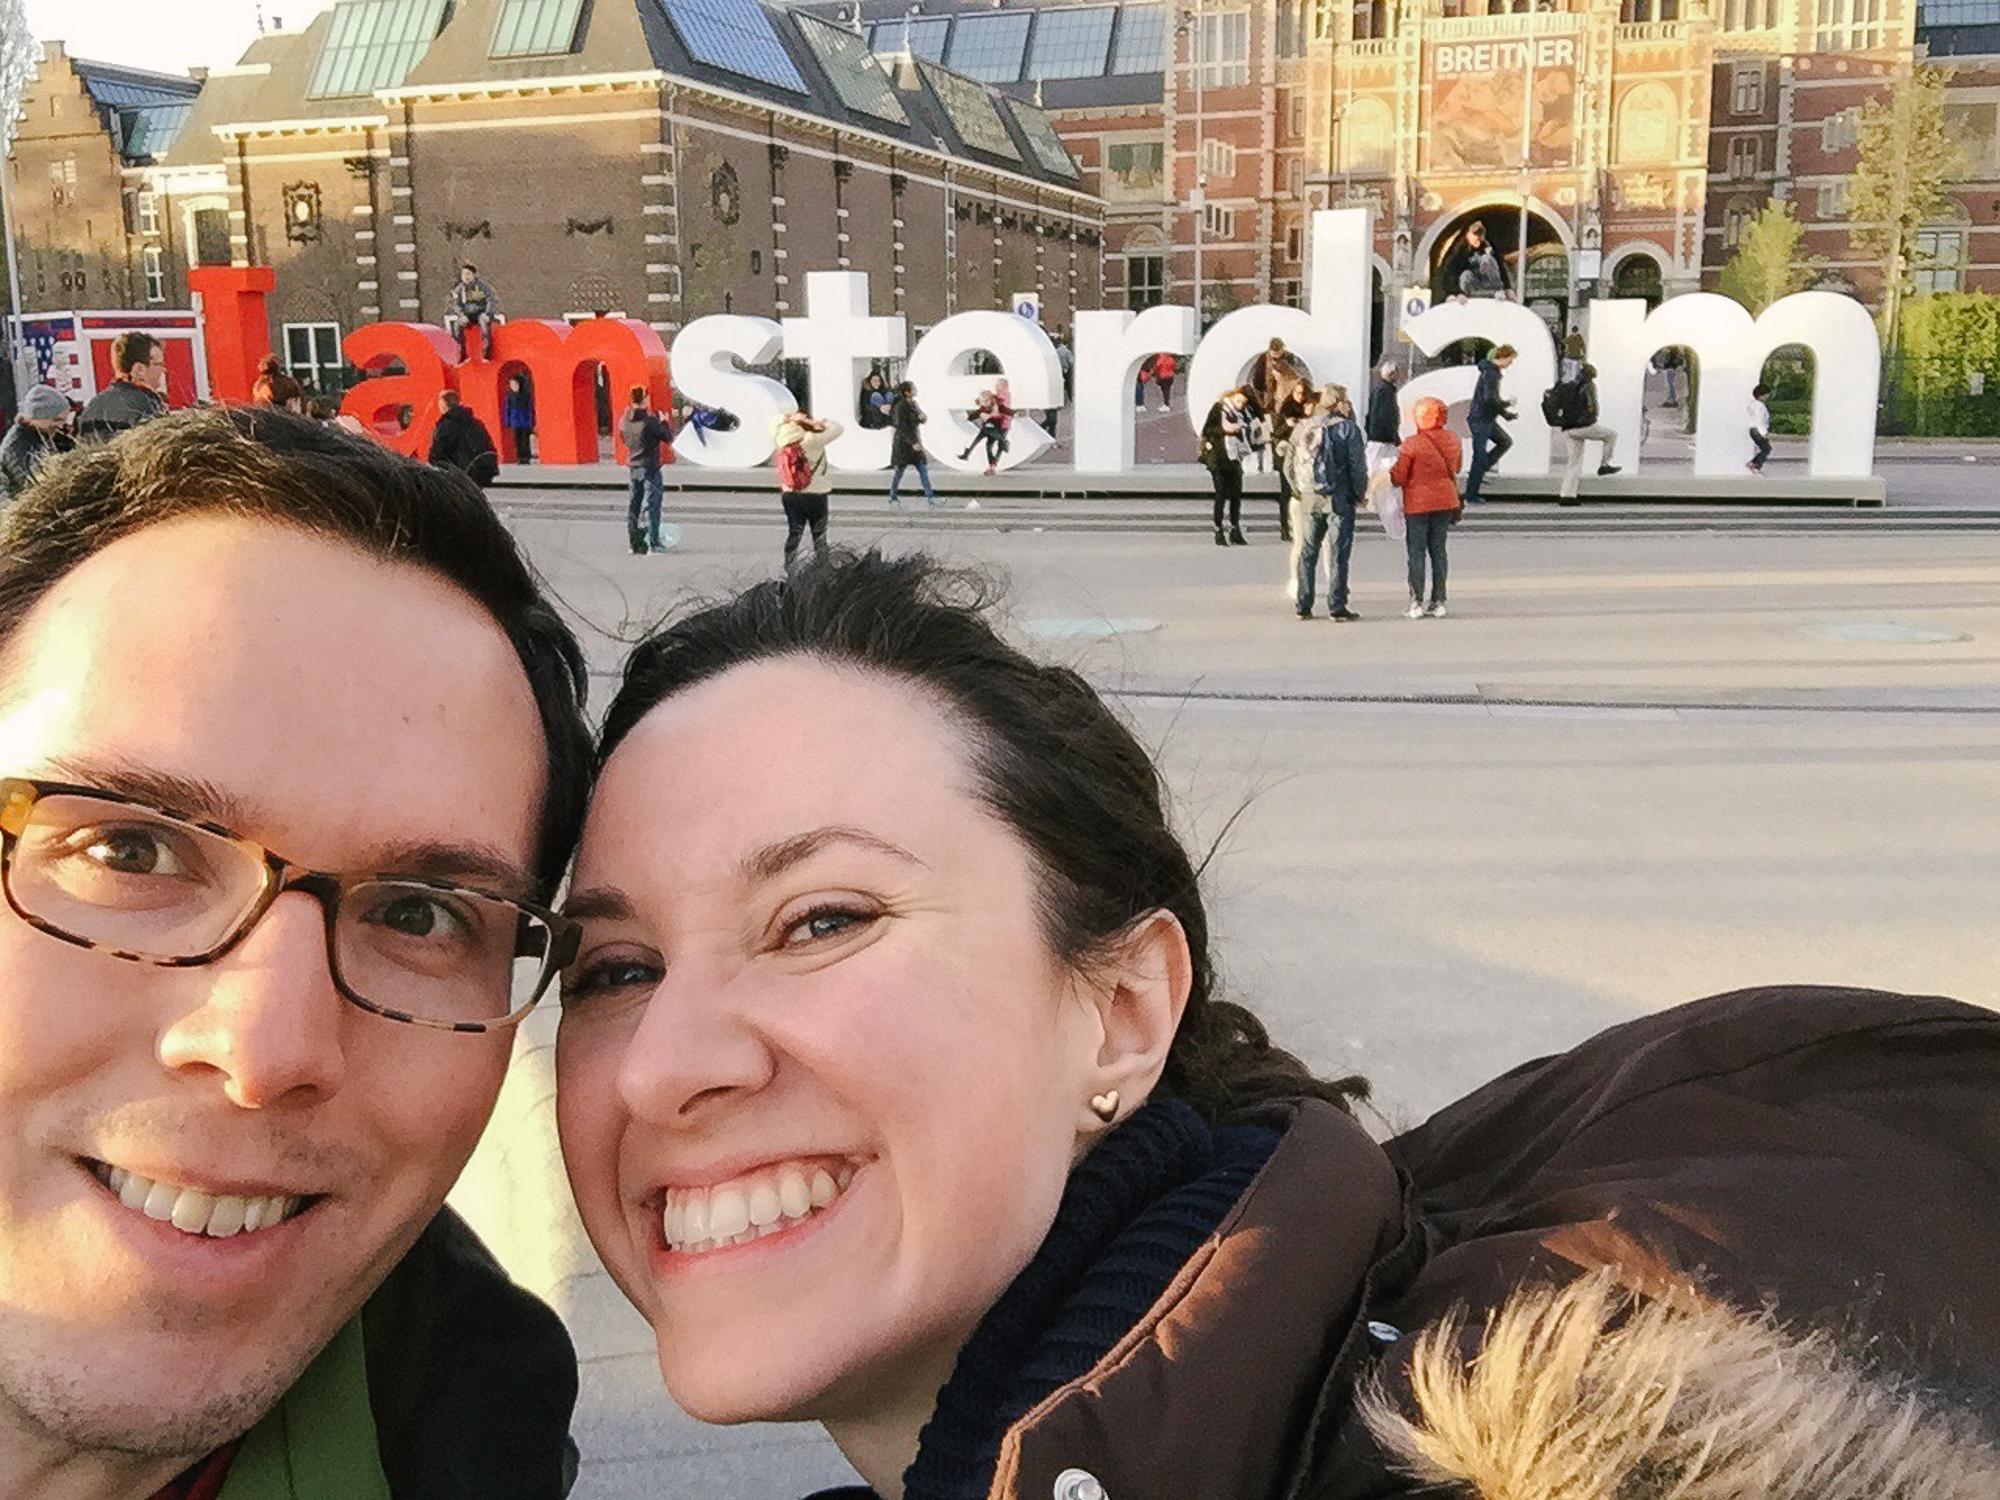 I amsterdam sign / Meseumplein / Amsterdam / iPhone 6